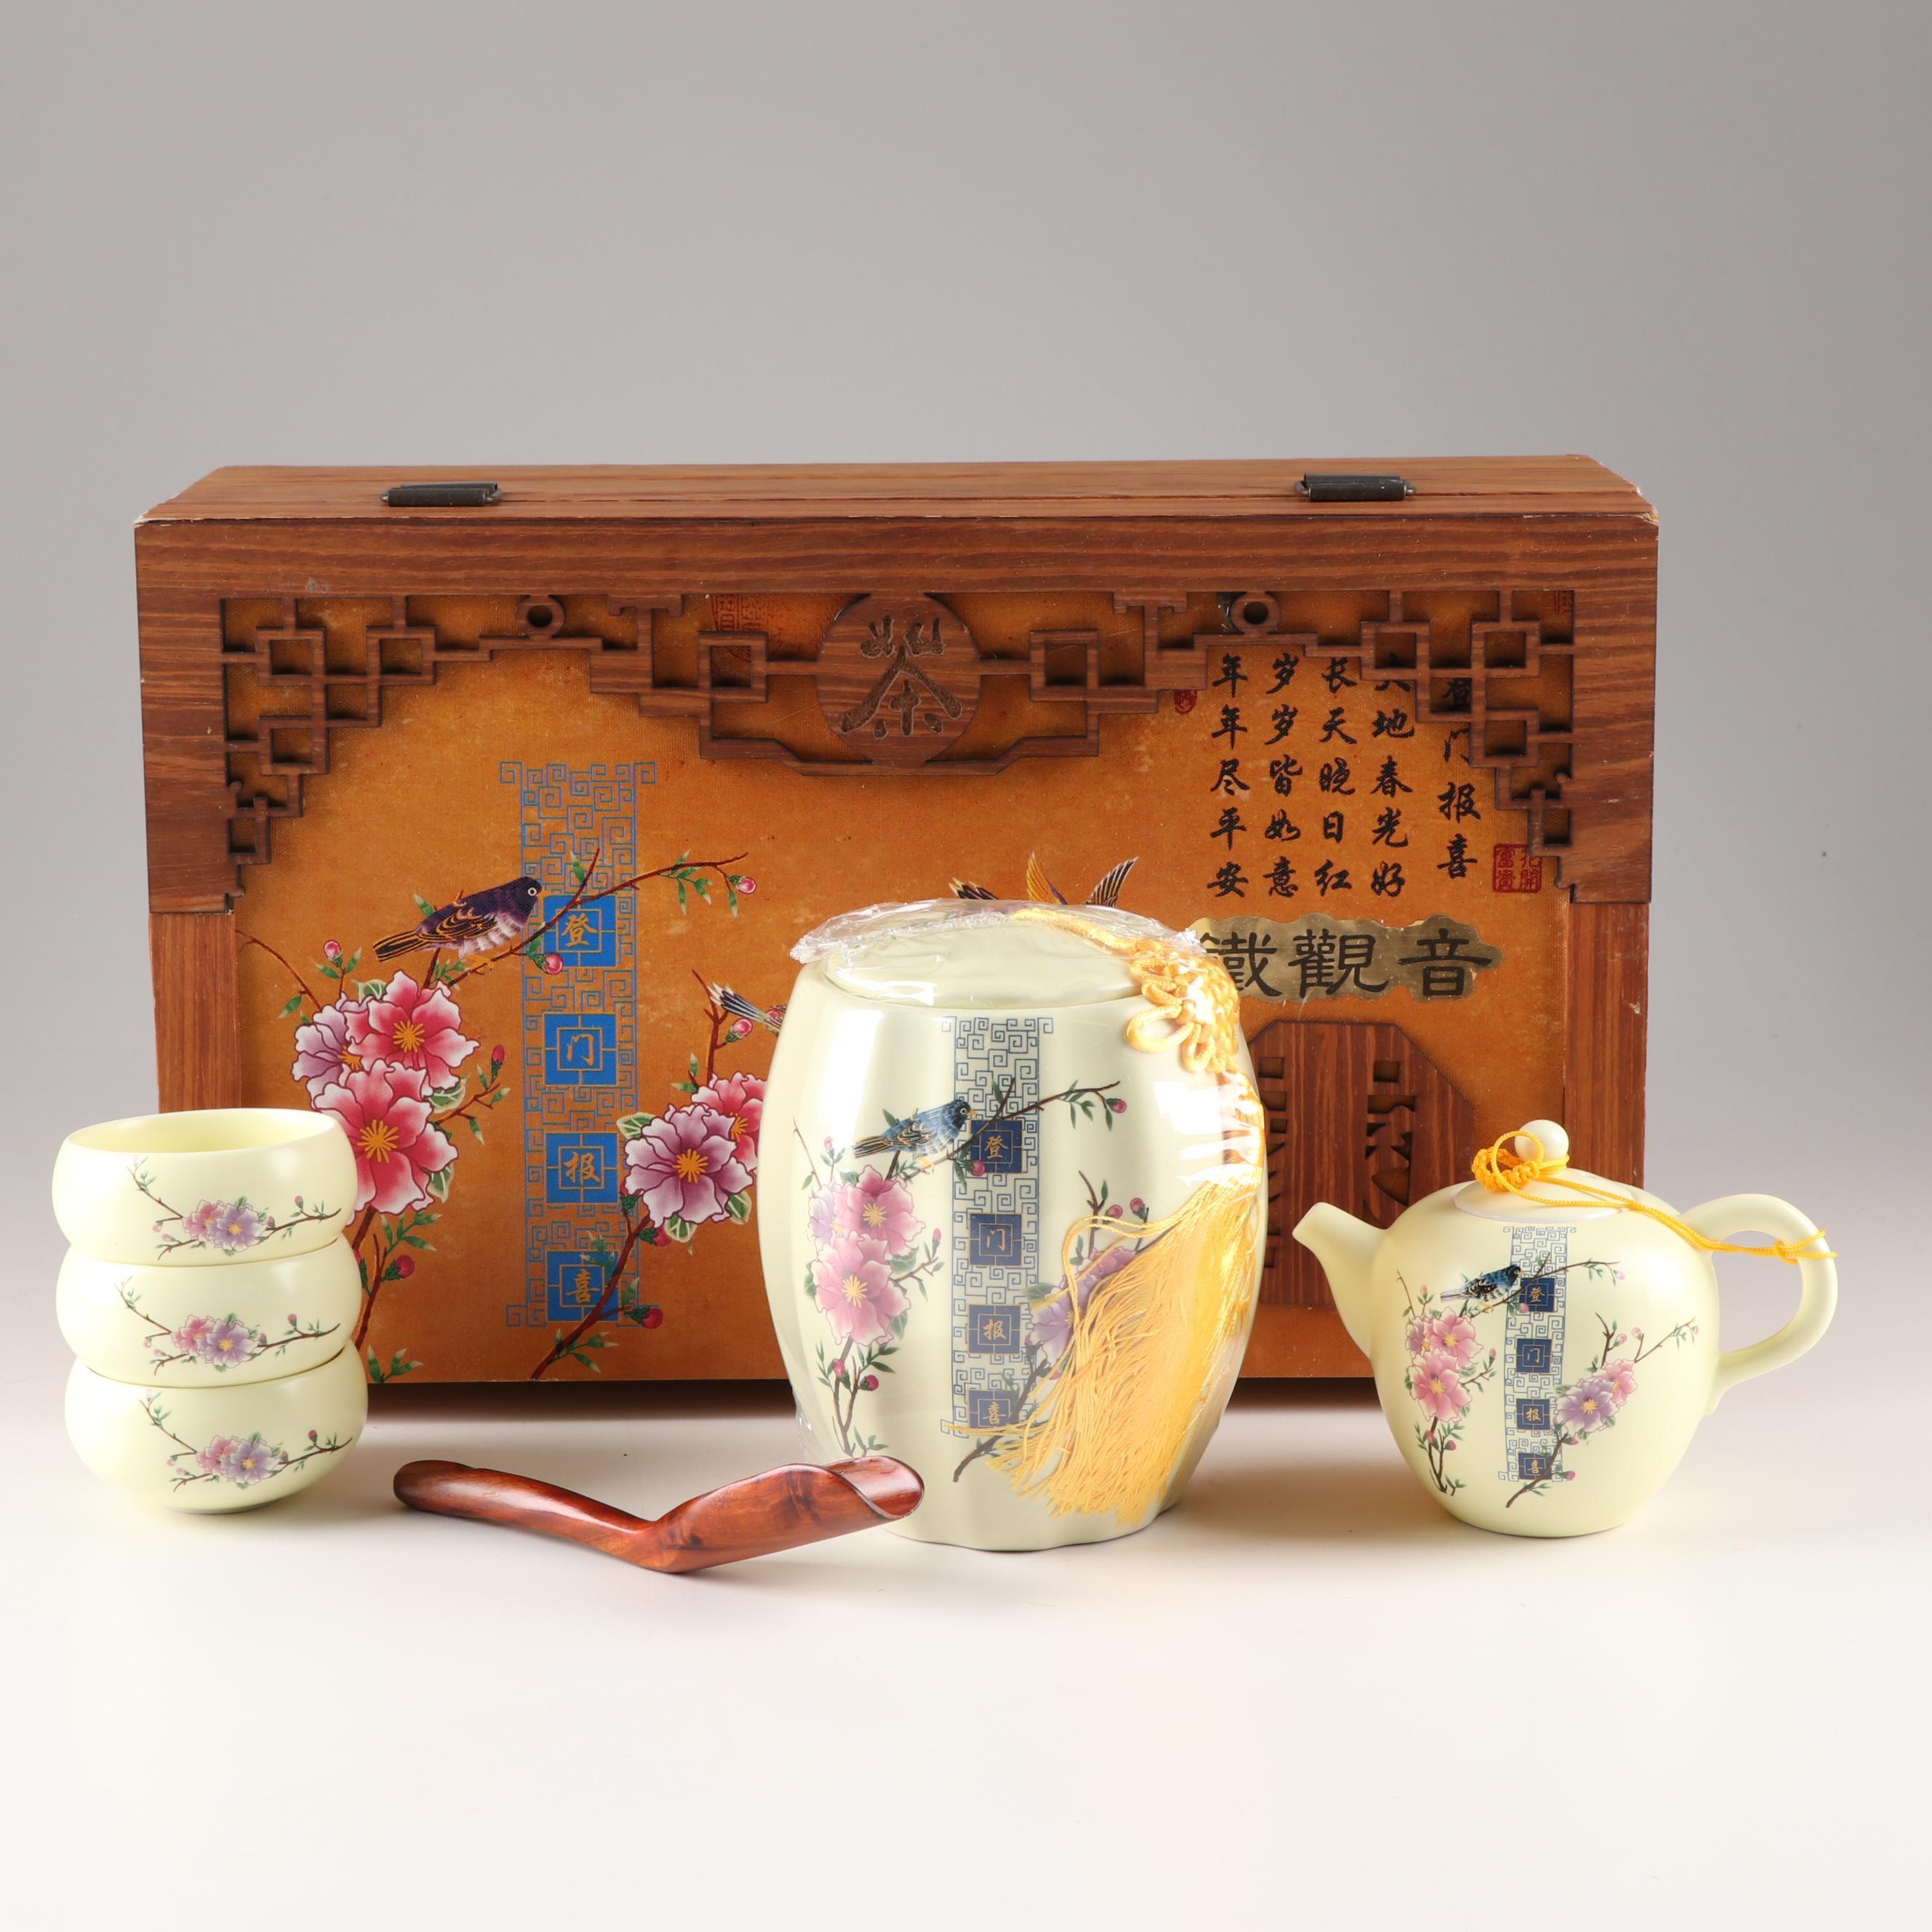 Boxed Chinese Ceramic Tea Set